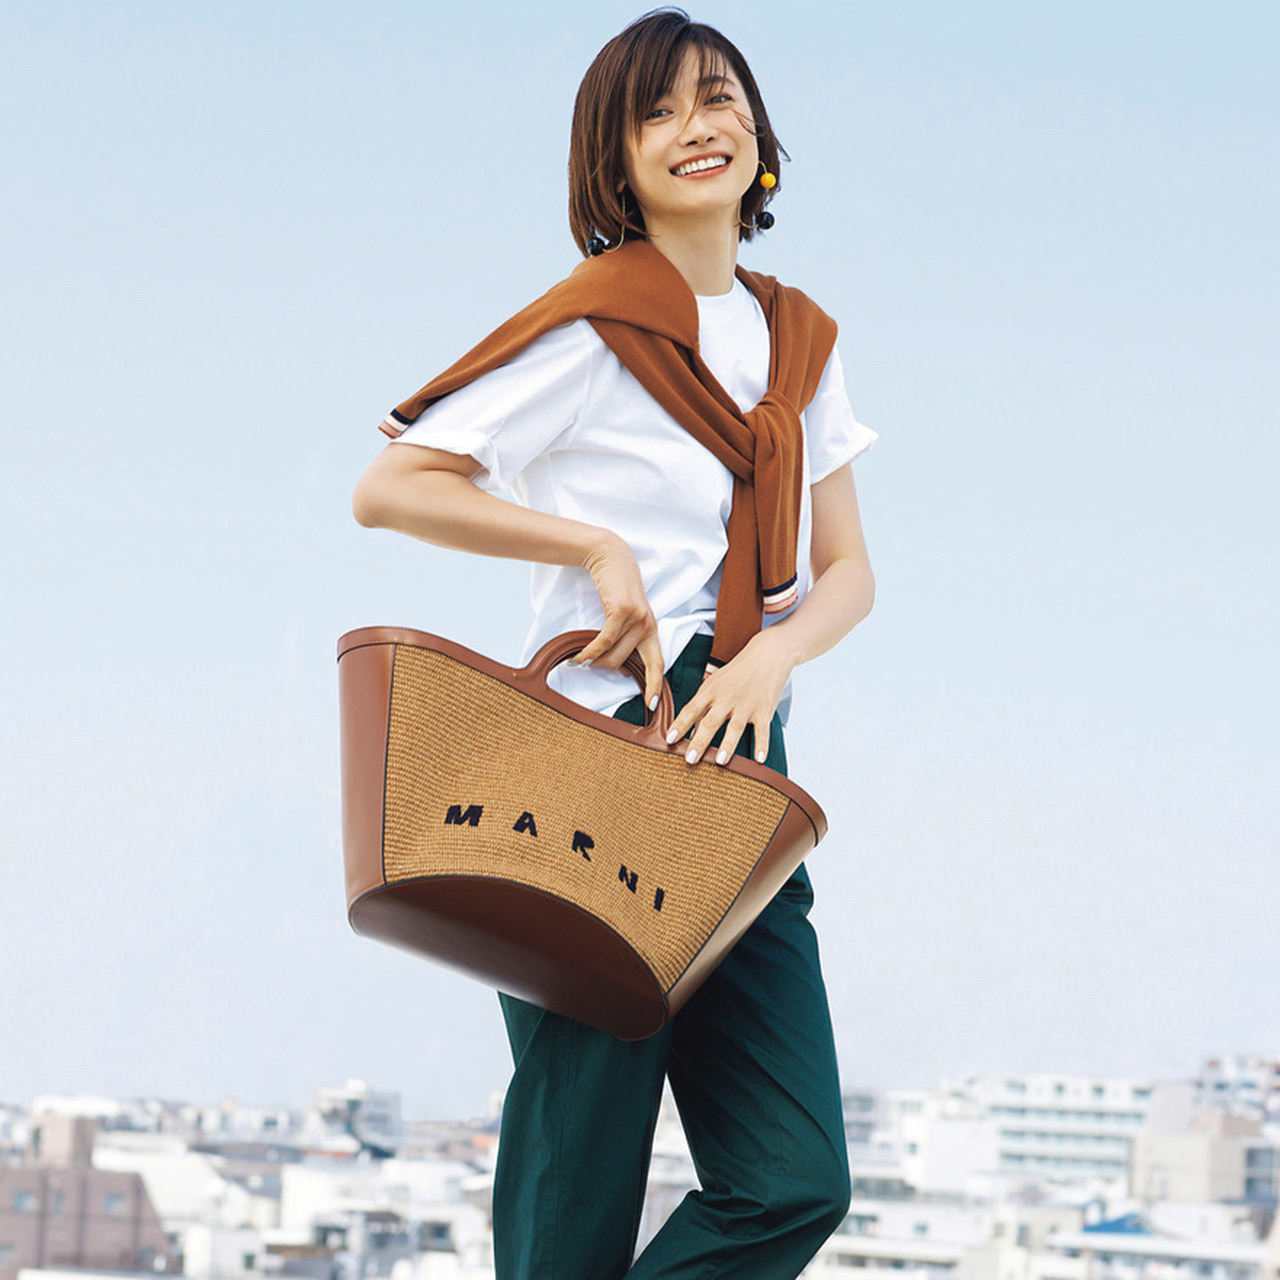 MARNI 相思相愛なTシャツ×ラフィアバッグ。開放感と都会的なムードを兼ね備えて